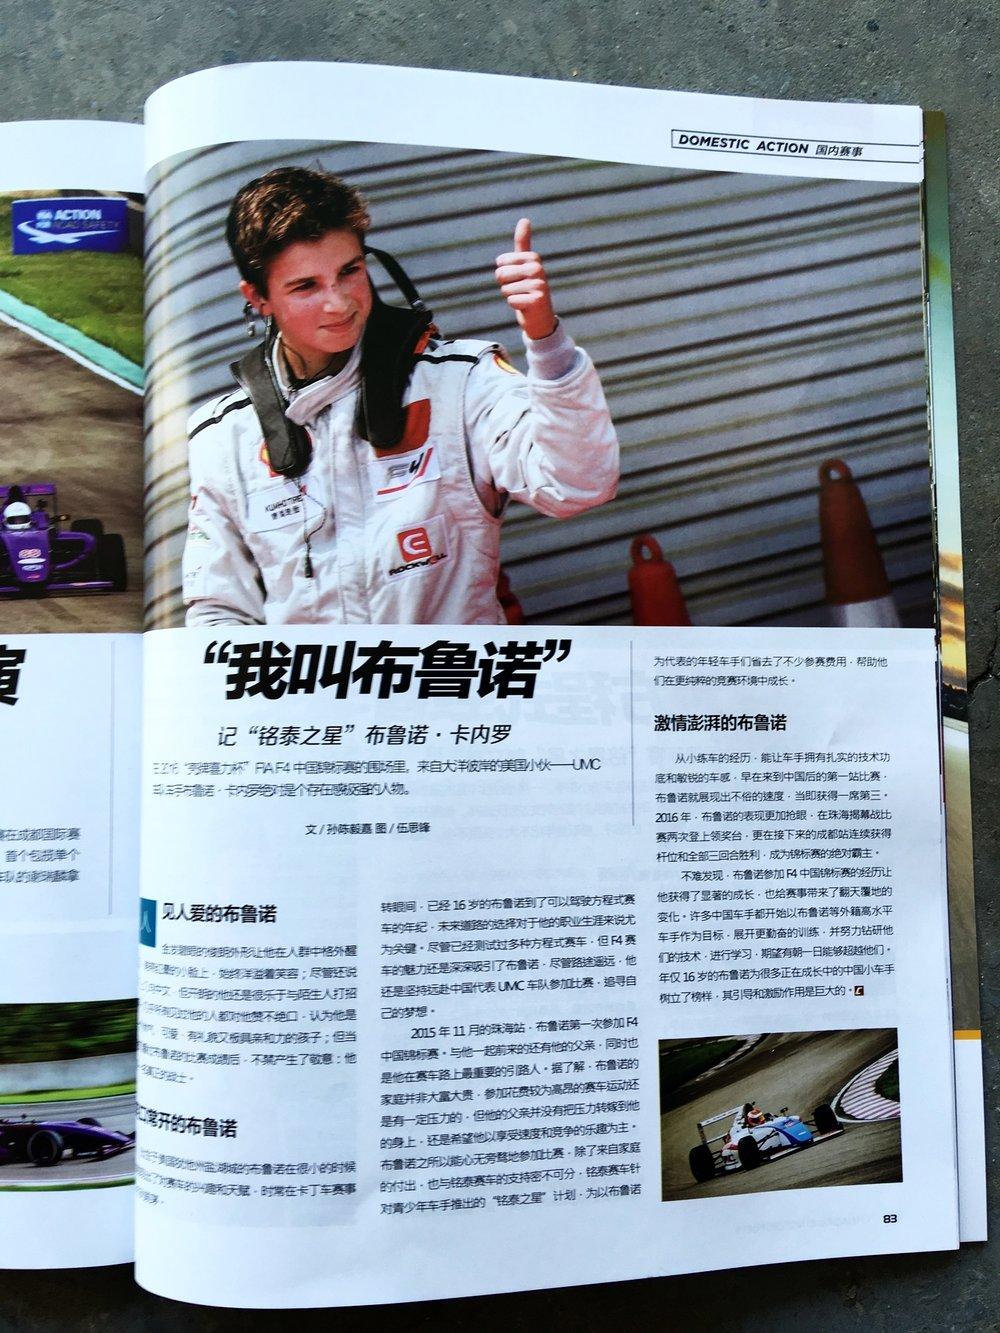 ChinaGrand Motorsports magazine story about Bruno Carneiro on it's May 2016 edition